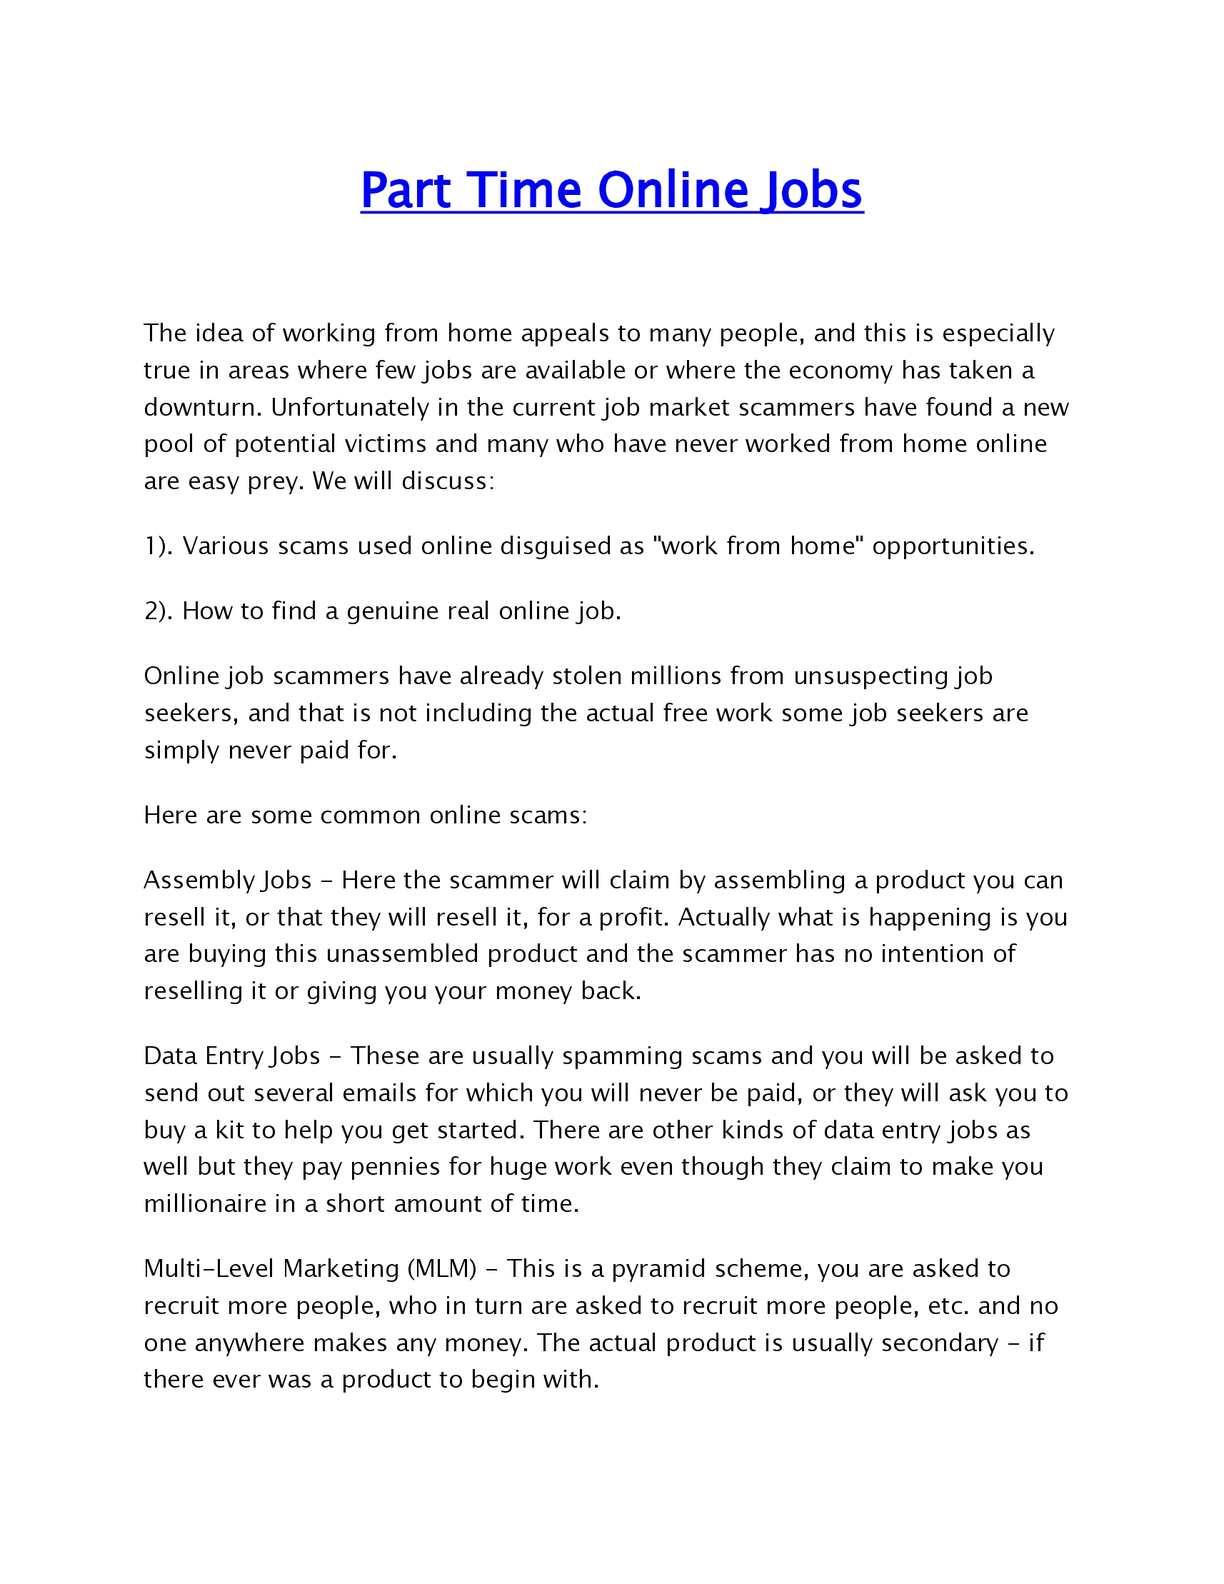 Calaméo - Part Time Online Jobs